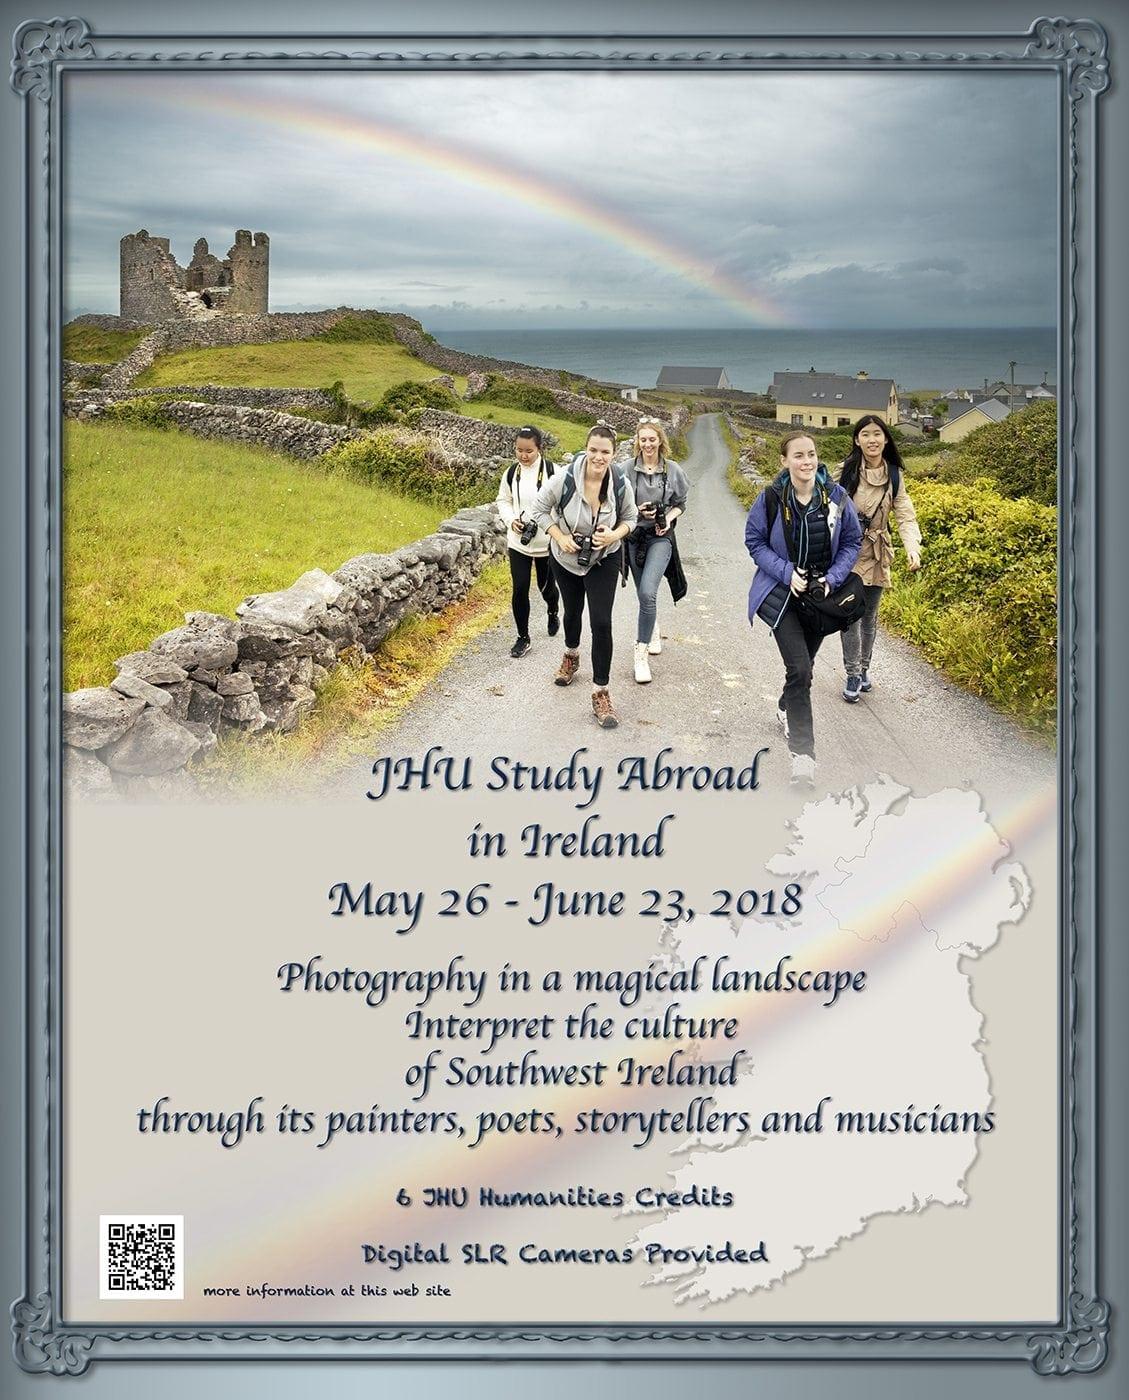 JHU Study Abroad in Ireland